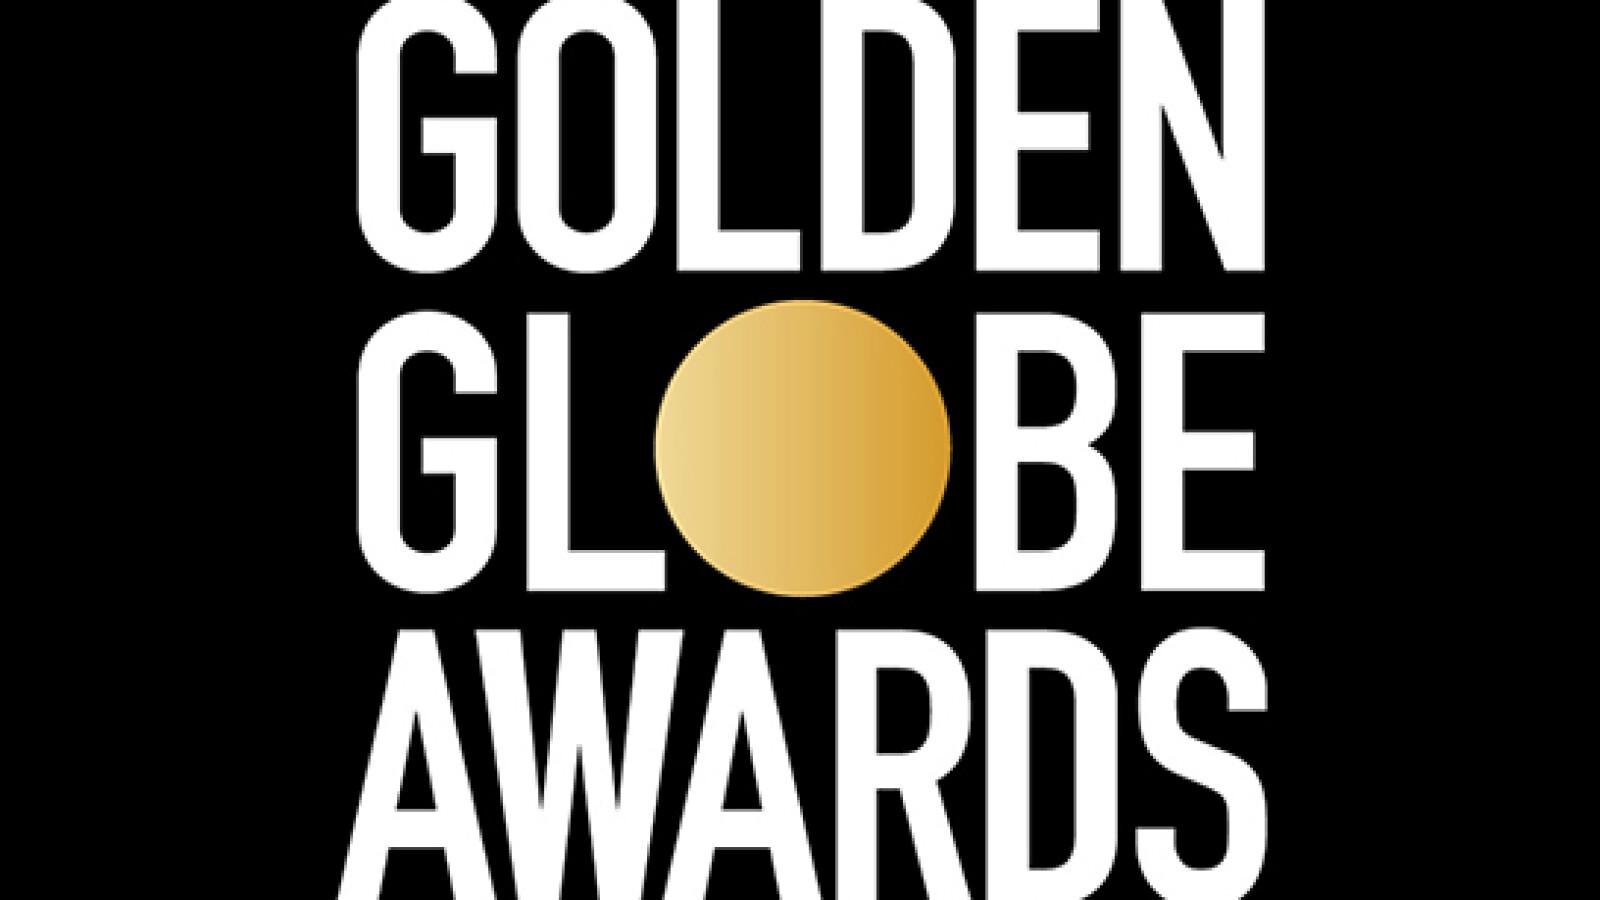 Golden Globes Stream